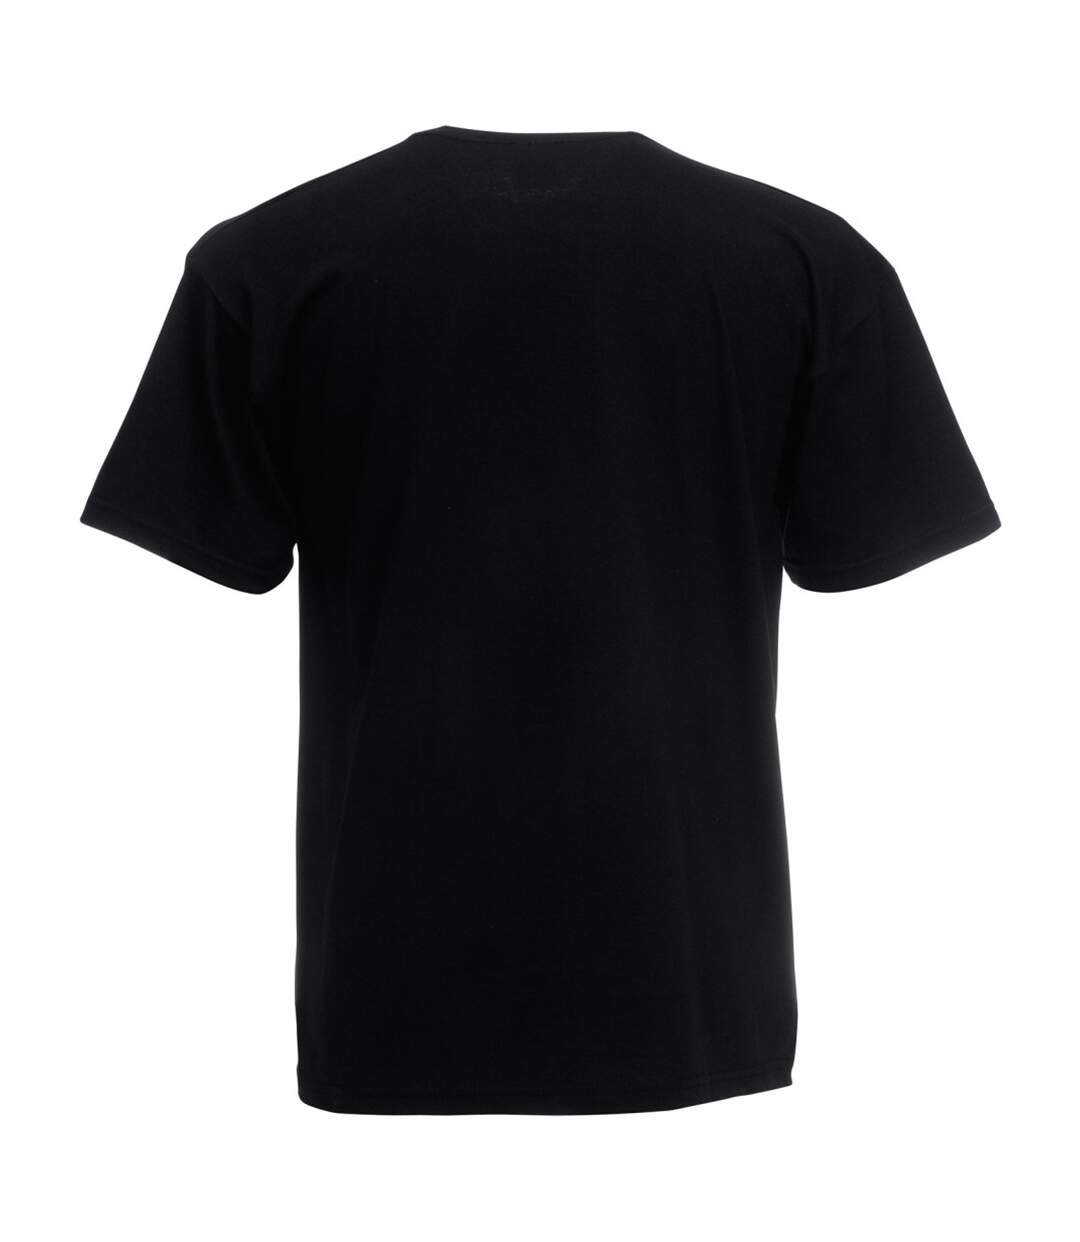 Mens Short Sleeve Casual T-Shirt (Jet Black) - UTBC3904